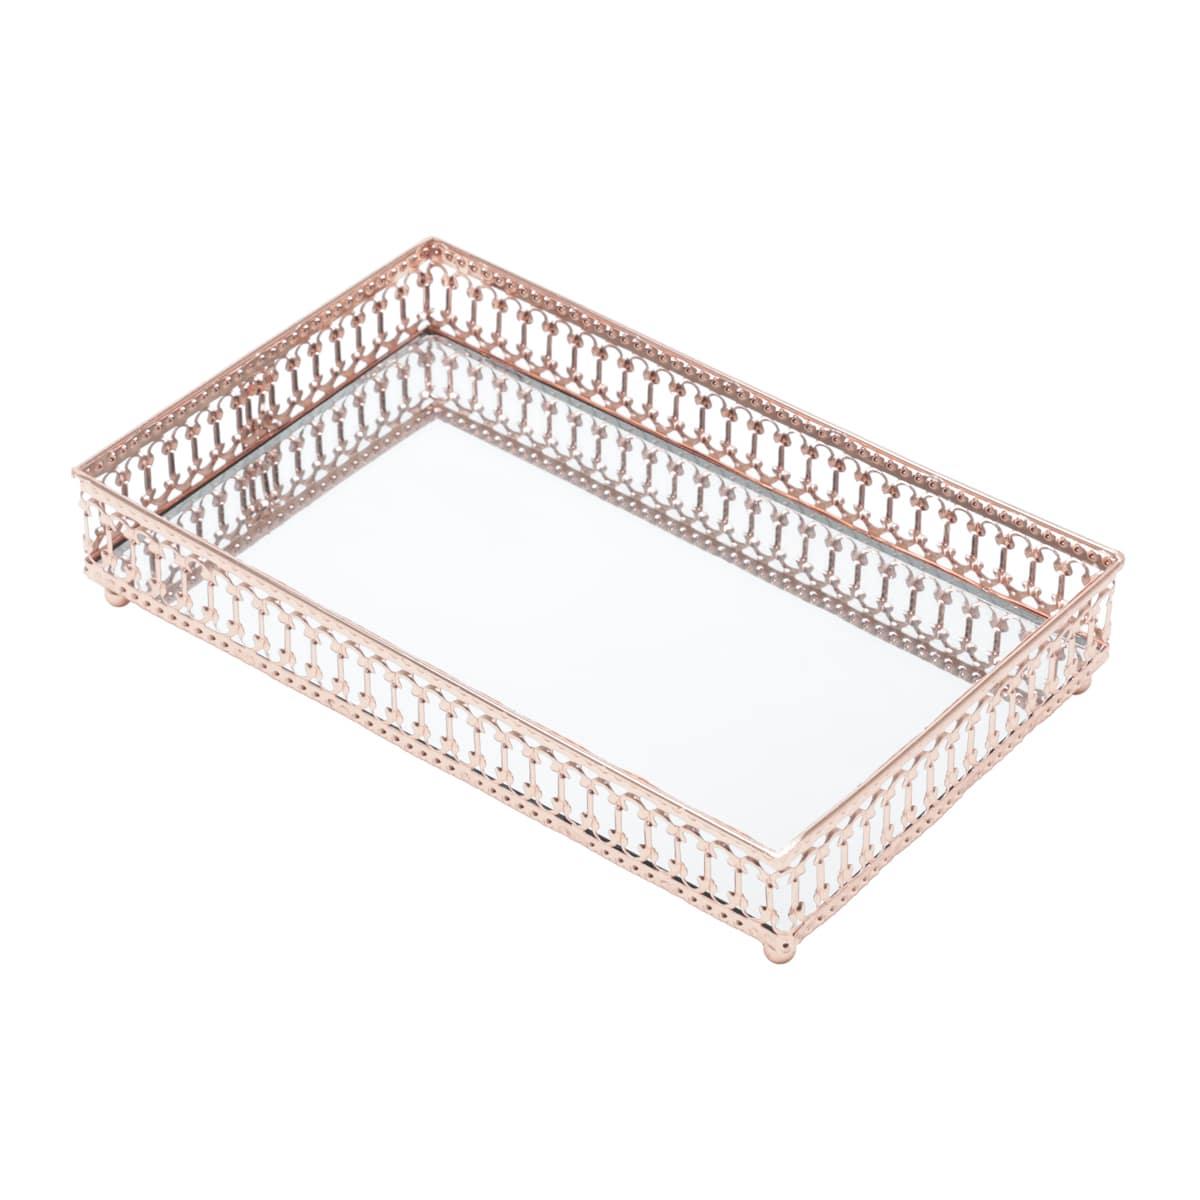 Bandeja Espelhada Cobre Metal Mirror Classic Border Retangular Luxo